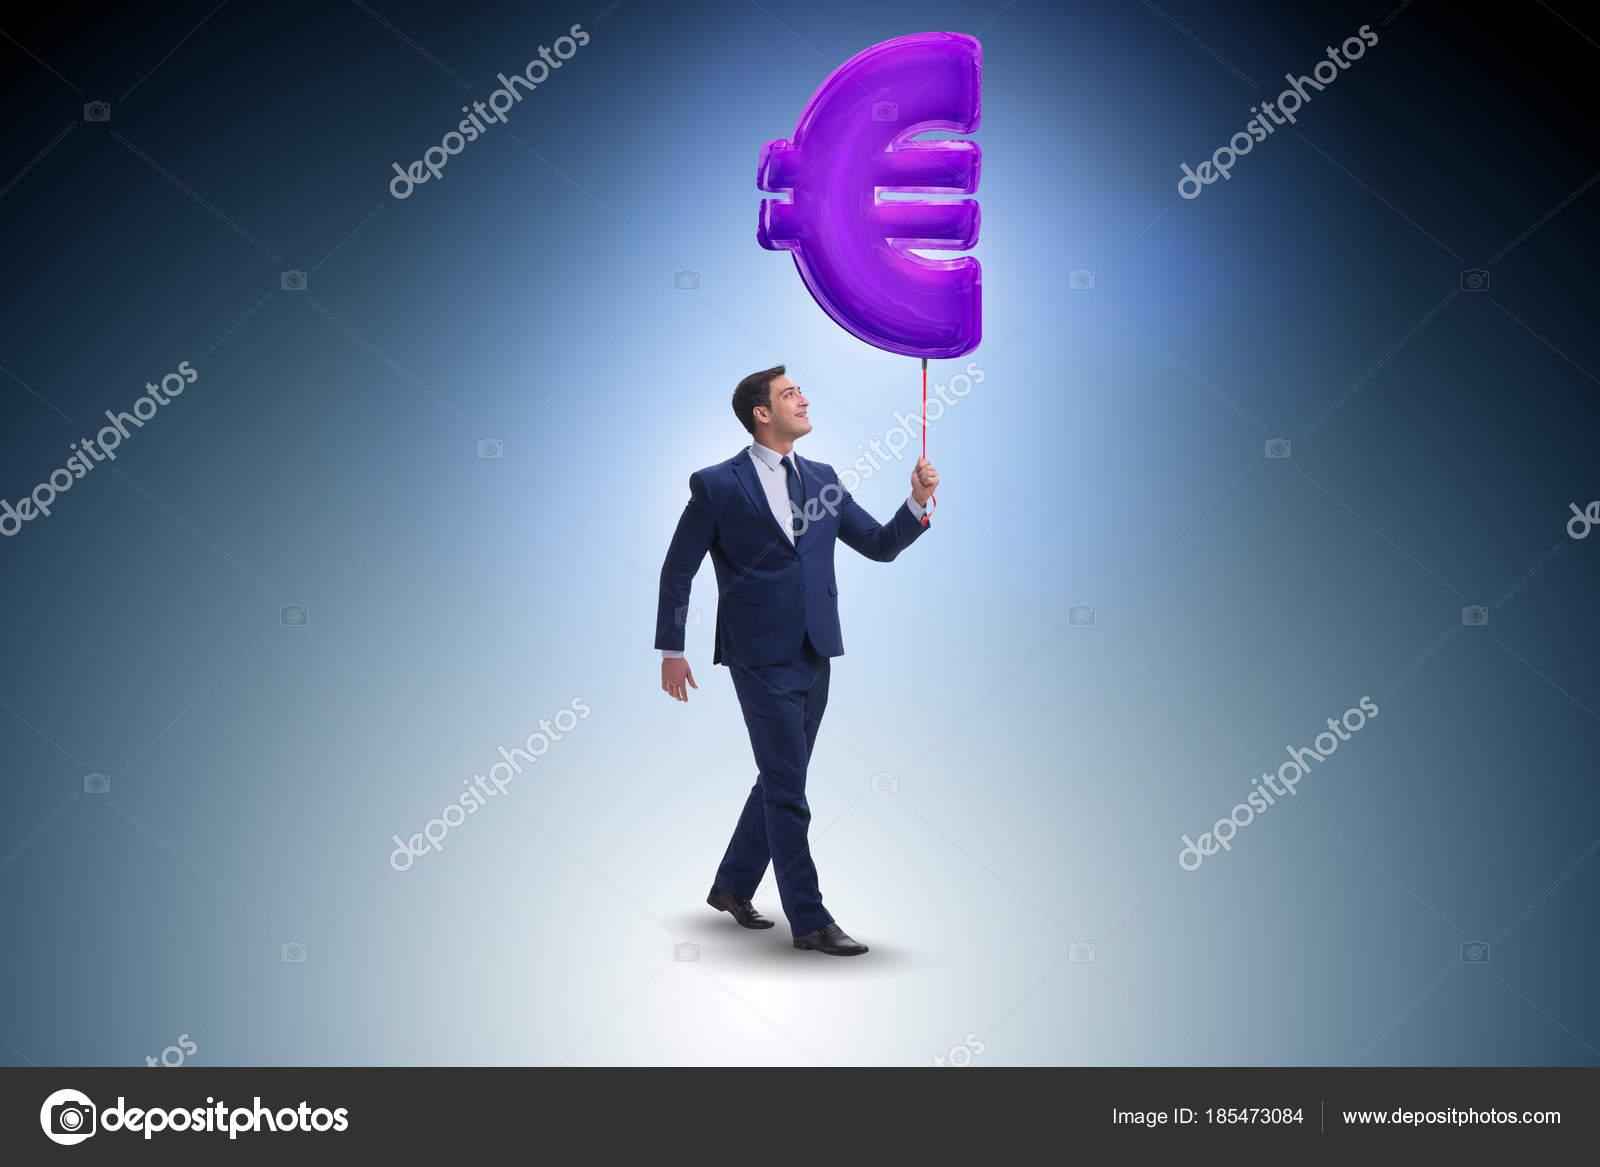 Design Wandlen zakenman wandelen met opblaasbare eurosymbool stockfoto elnur